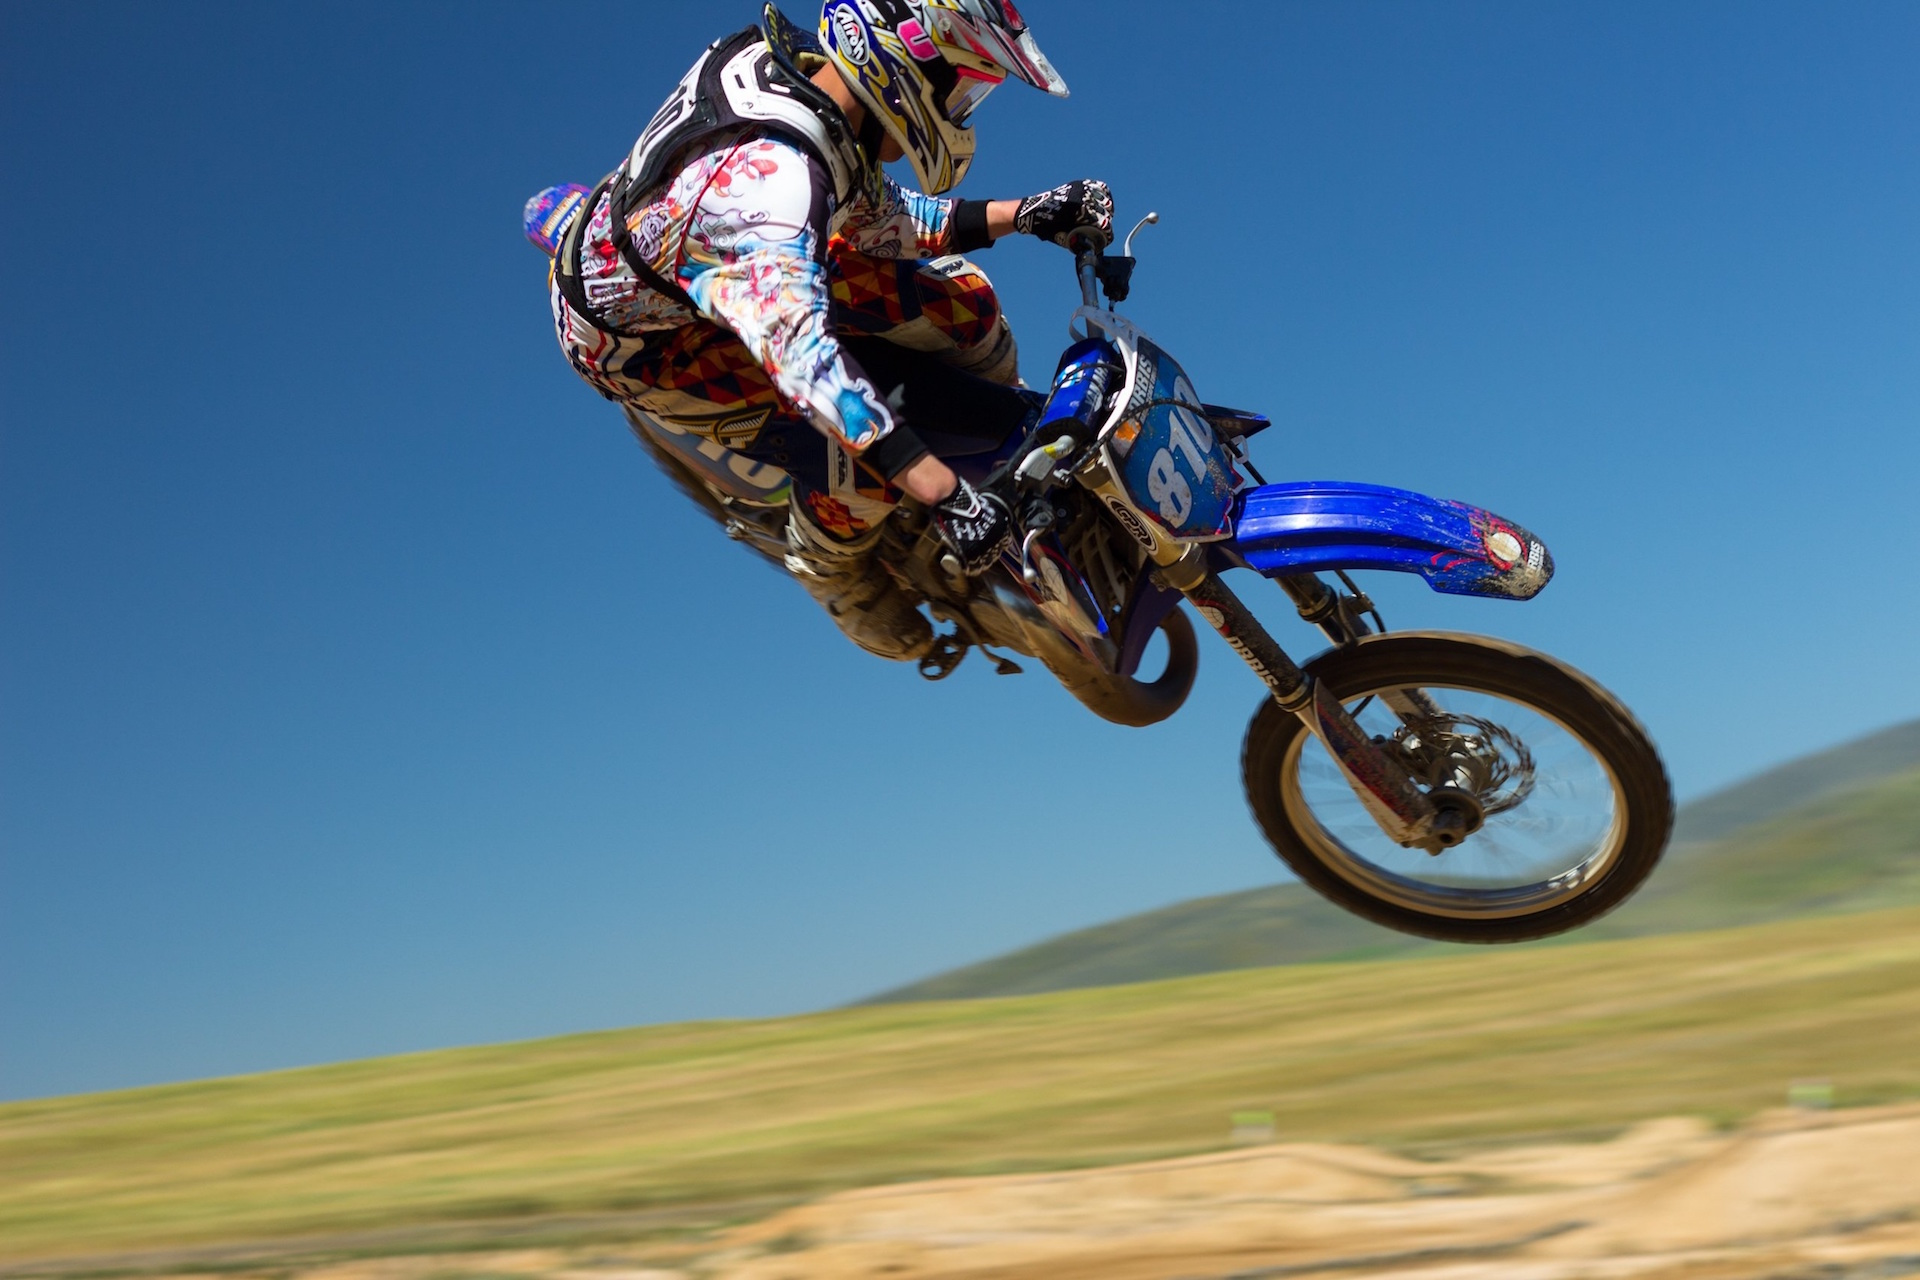 Motorrad, springen, Karriere, Risiko, Wettbewerb - Wallpaper HD - Prof.-falken.com